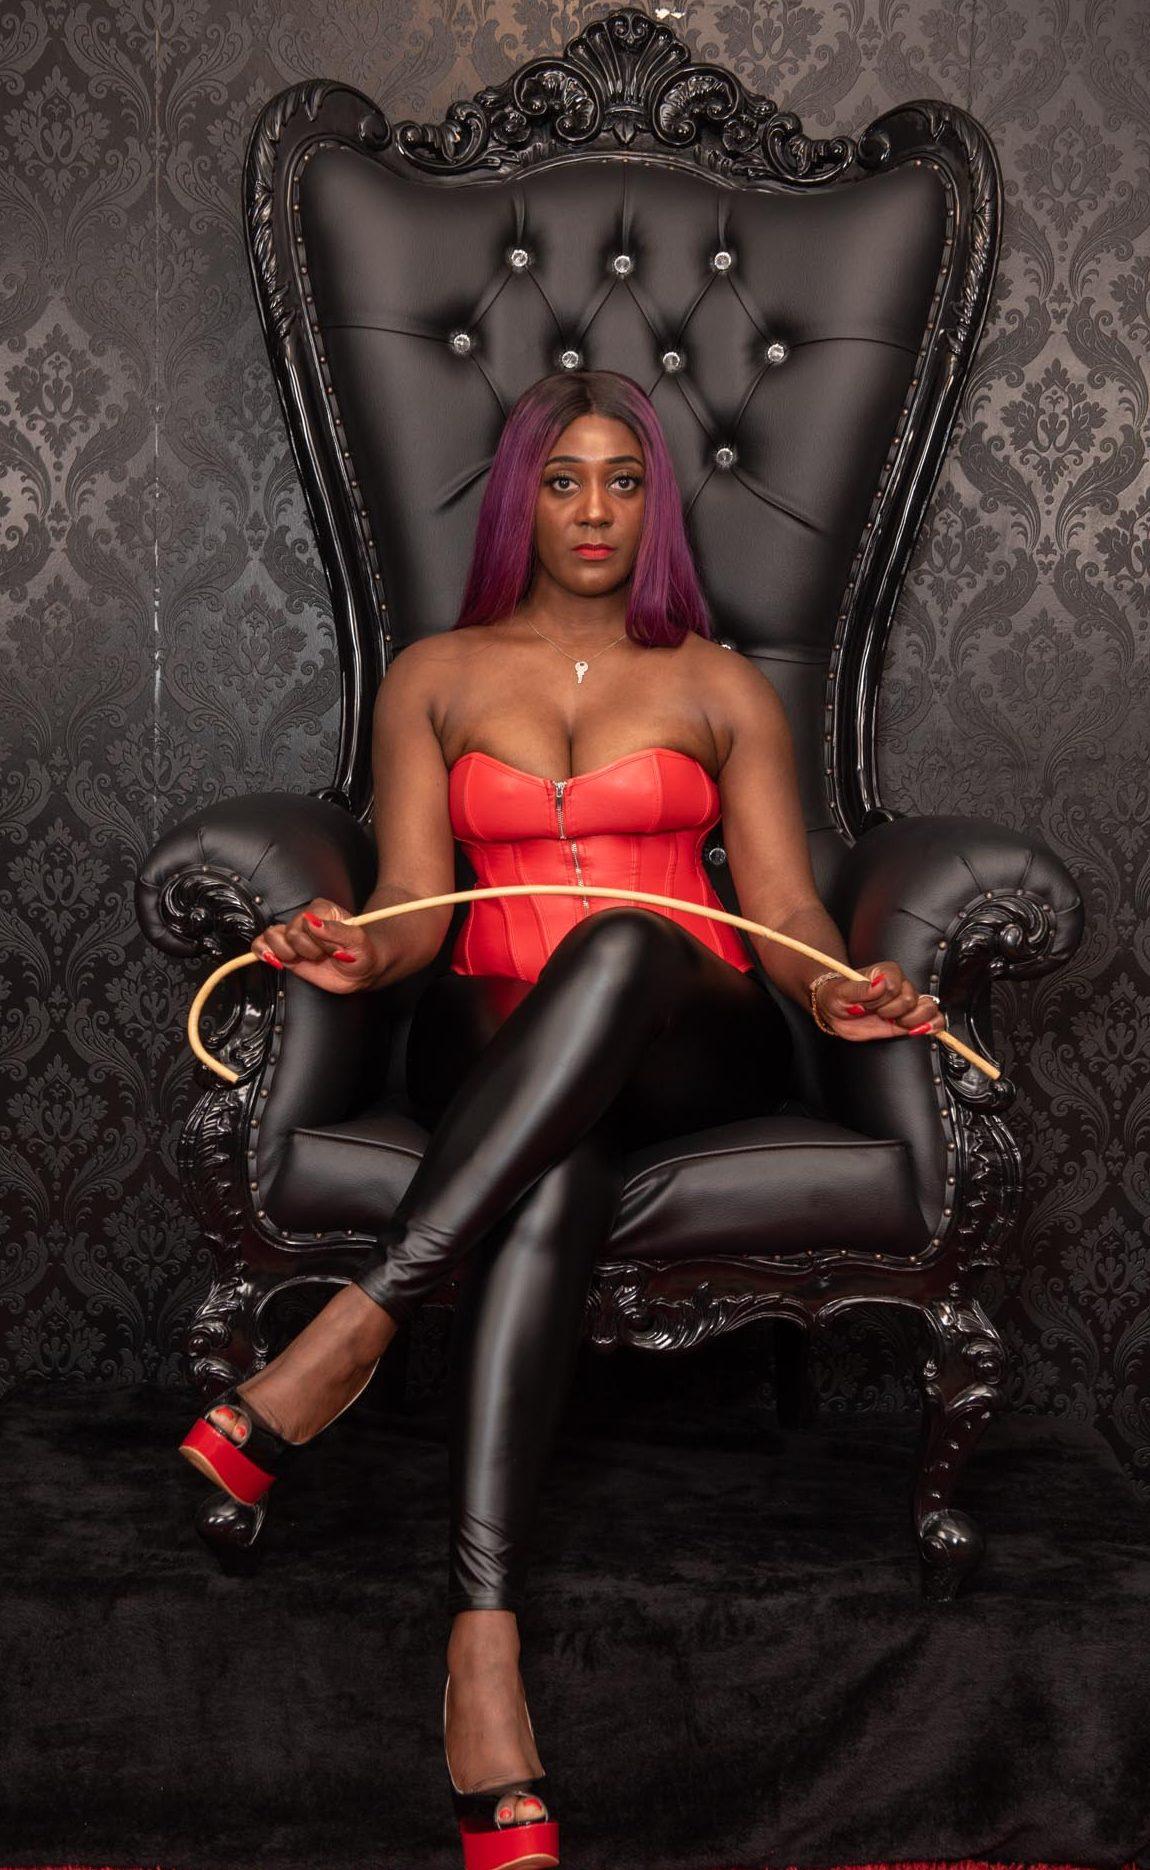 Mistress Lorraine with cane